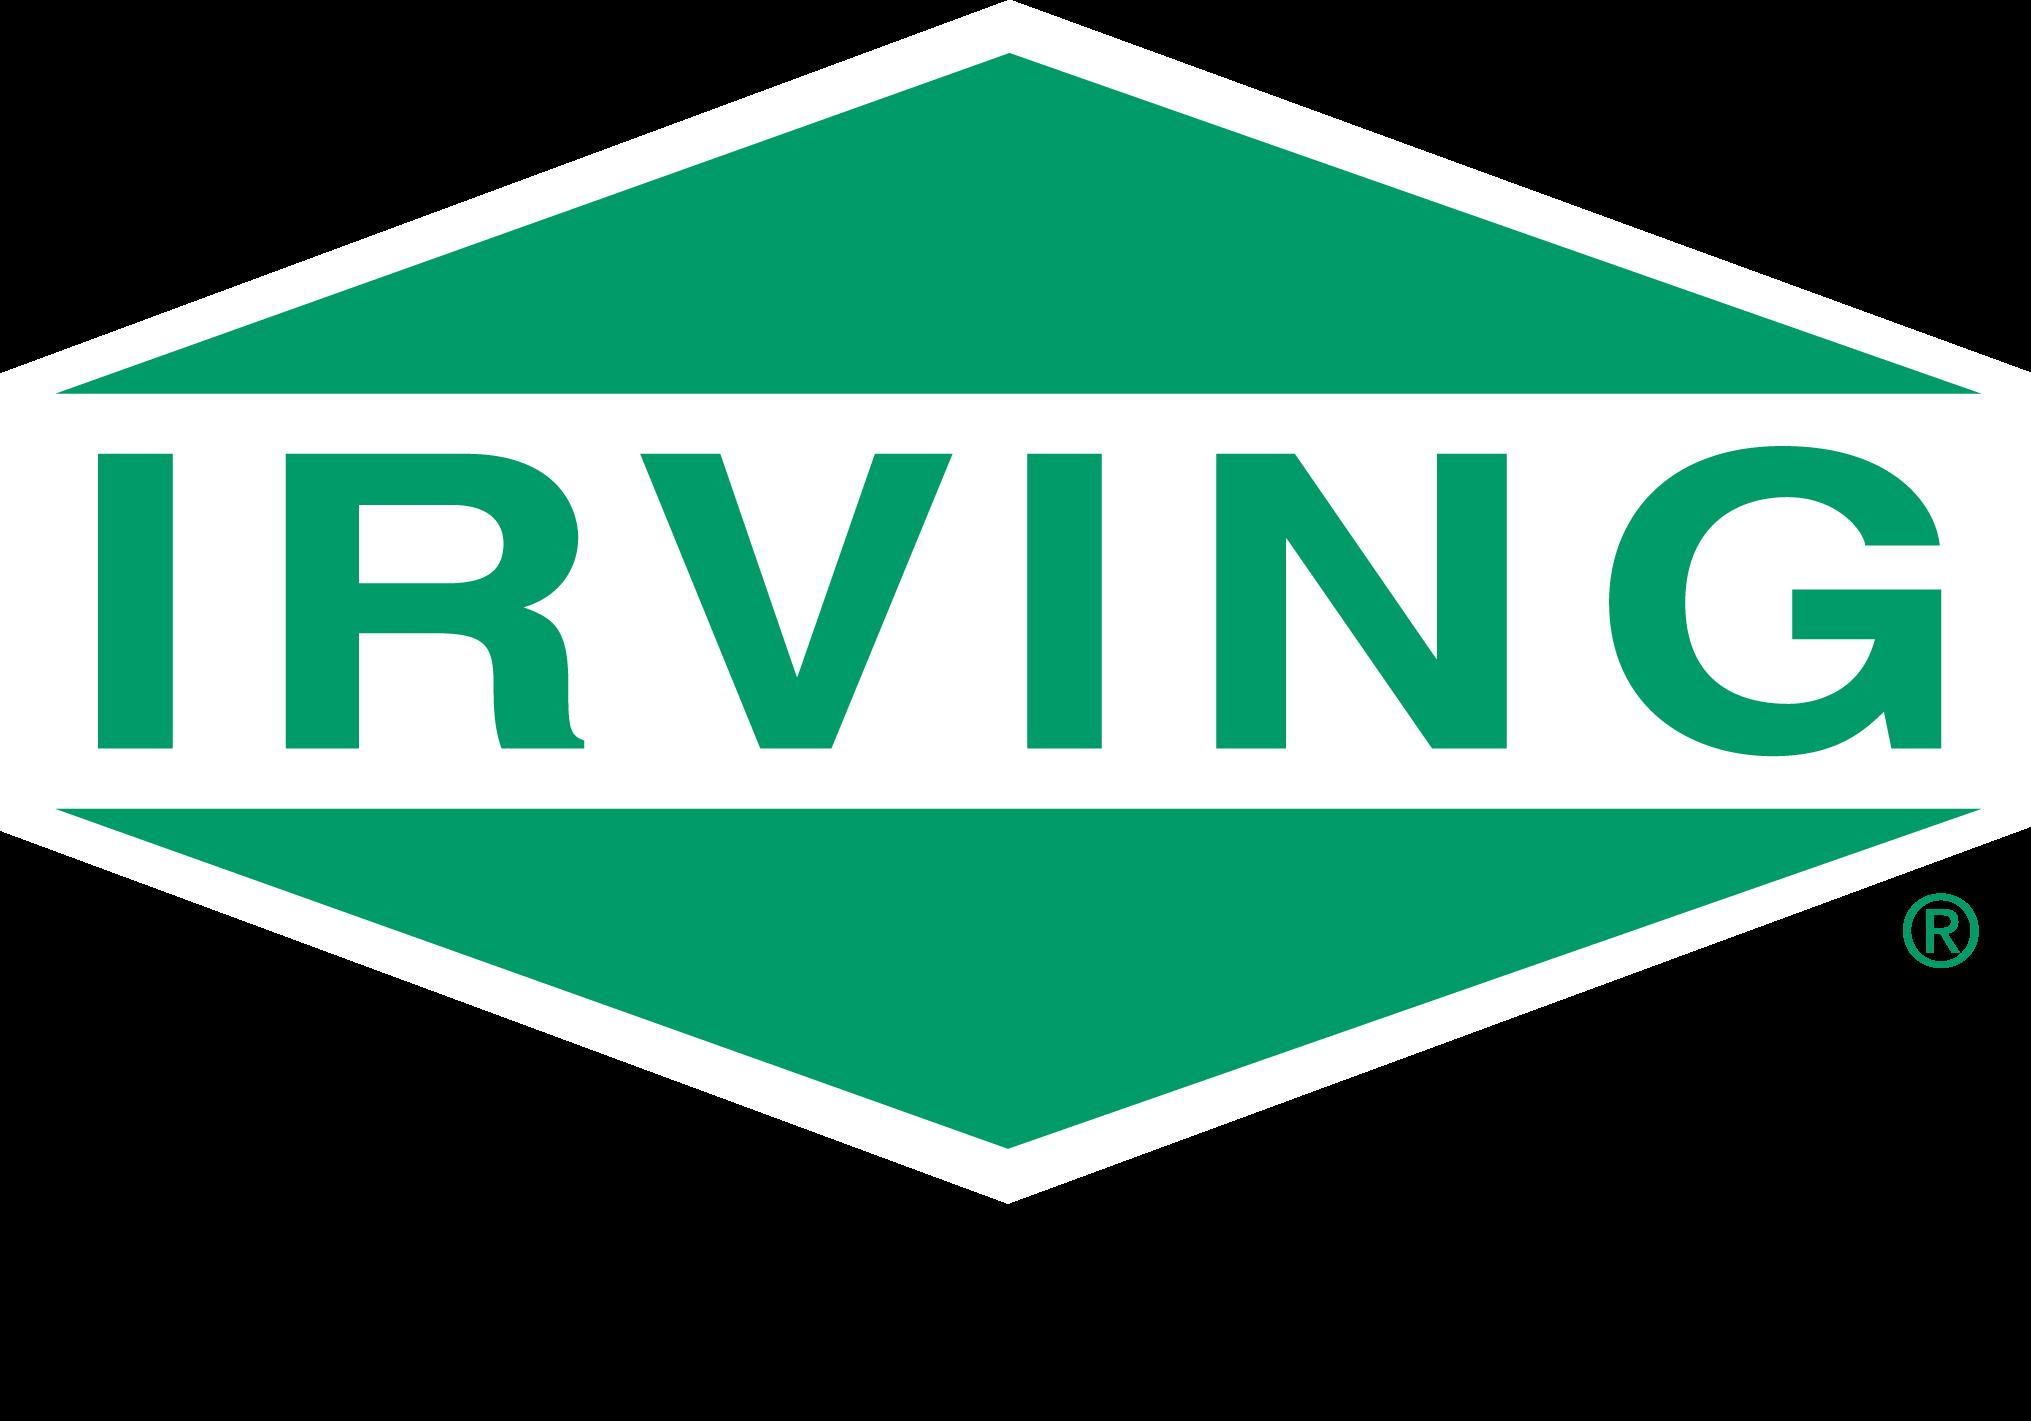 JD Irving